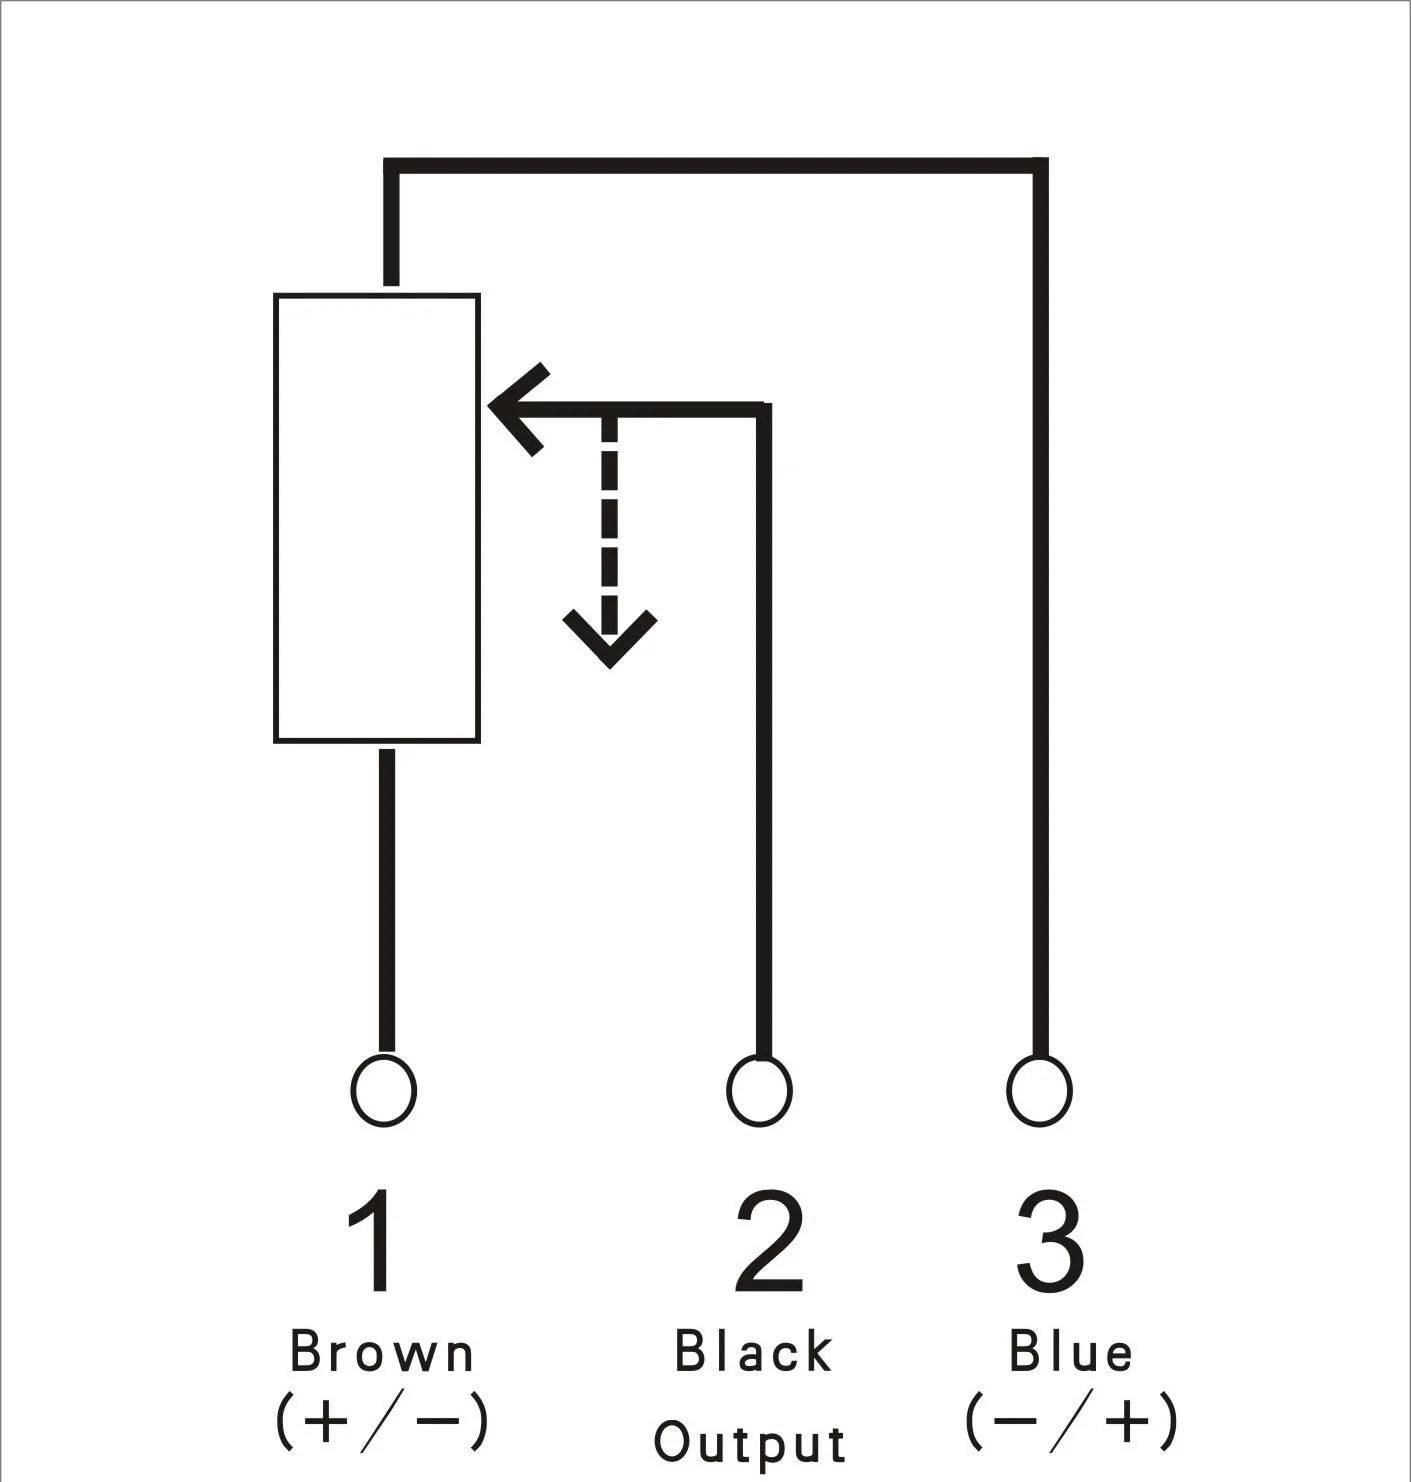 potentiometer wiring diagram wiring diagrams lol for a 10k potentiometer wiring diagrams little wiring diagrams joystick [ 1411 x 1482 Pixel ]